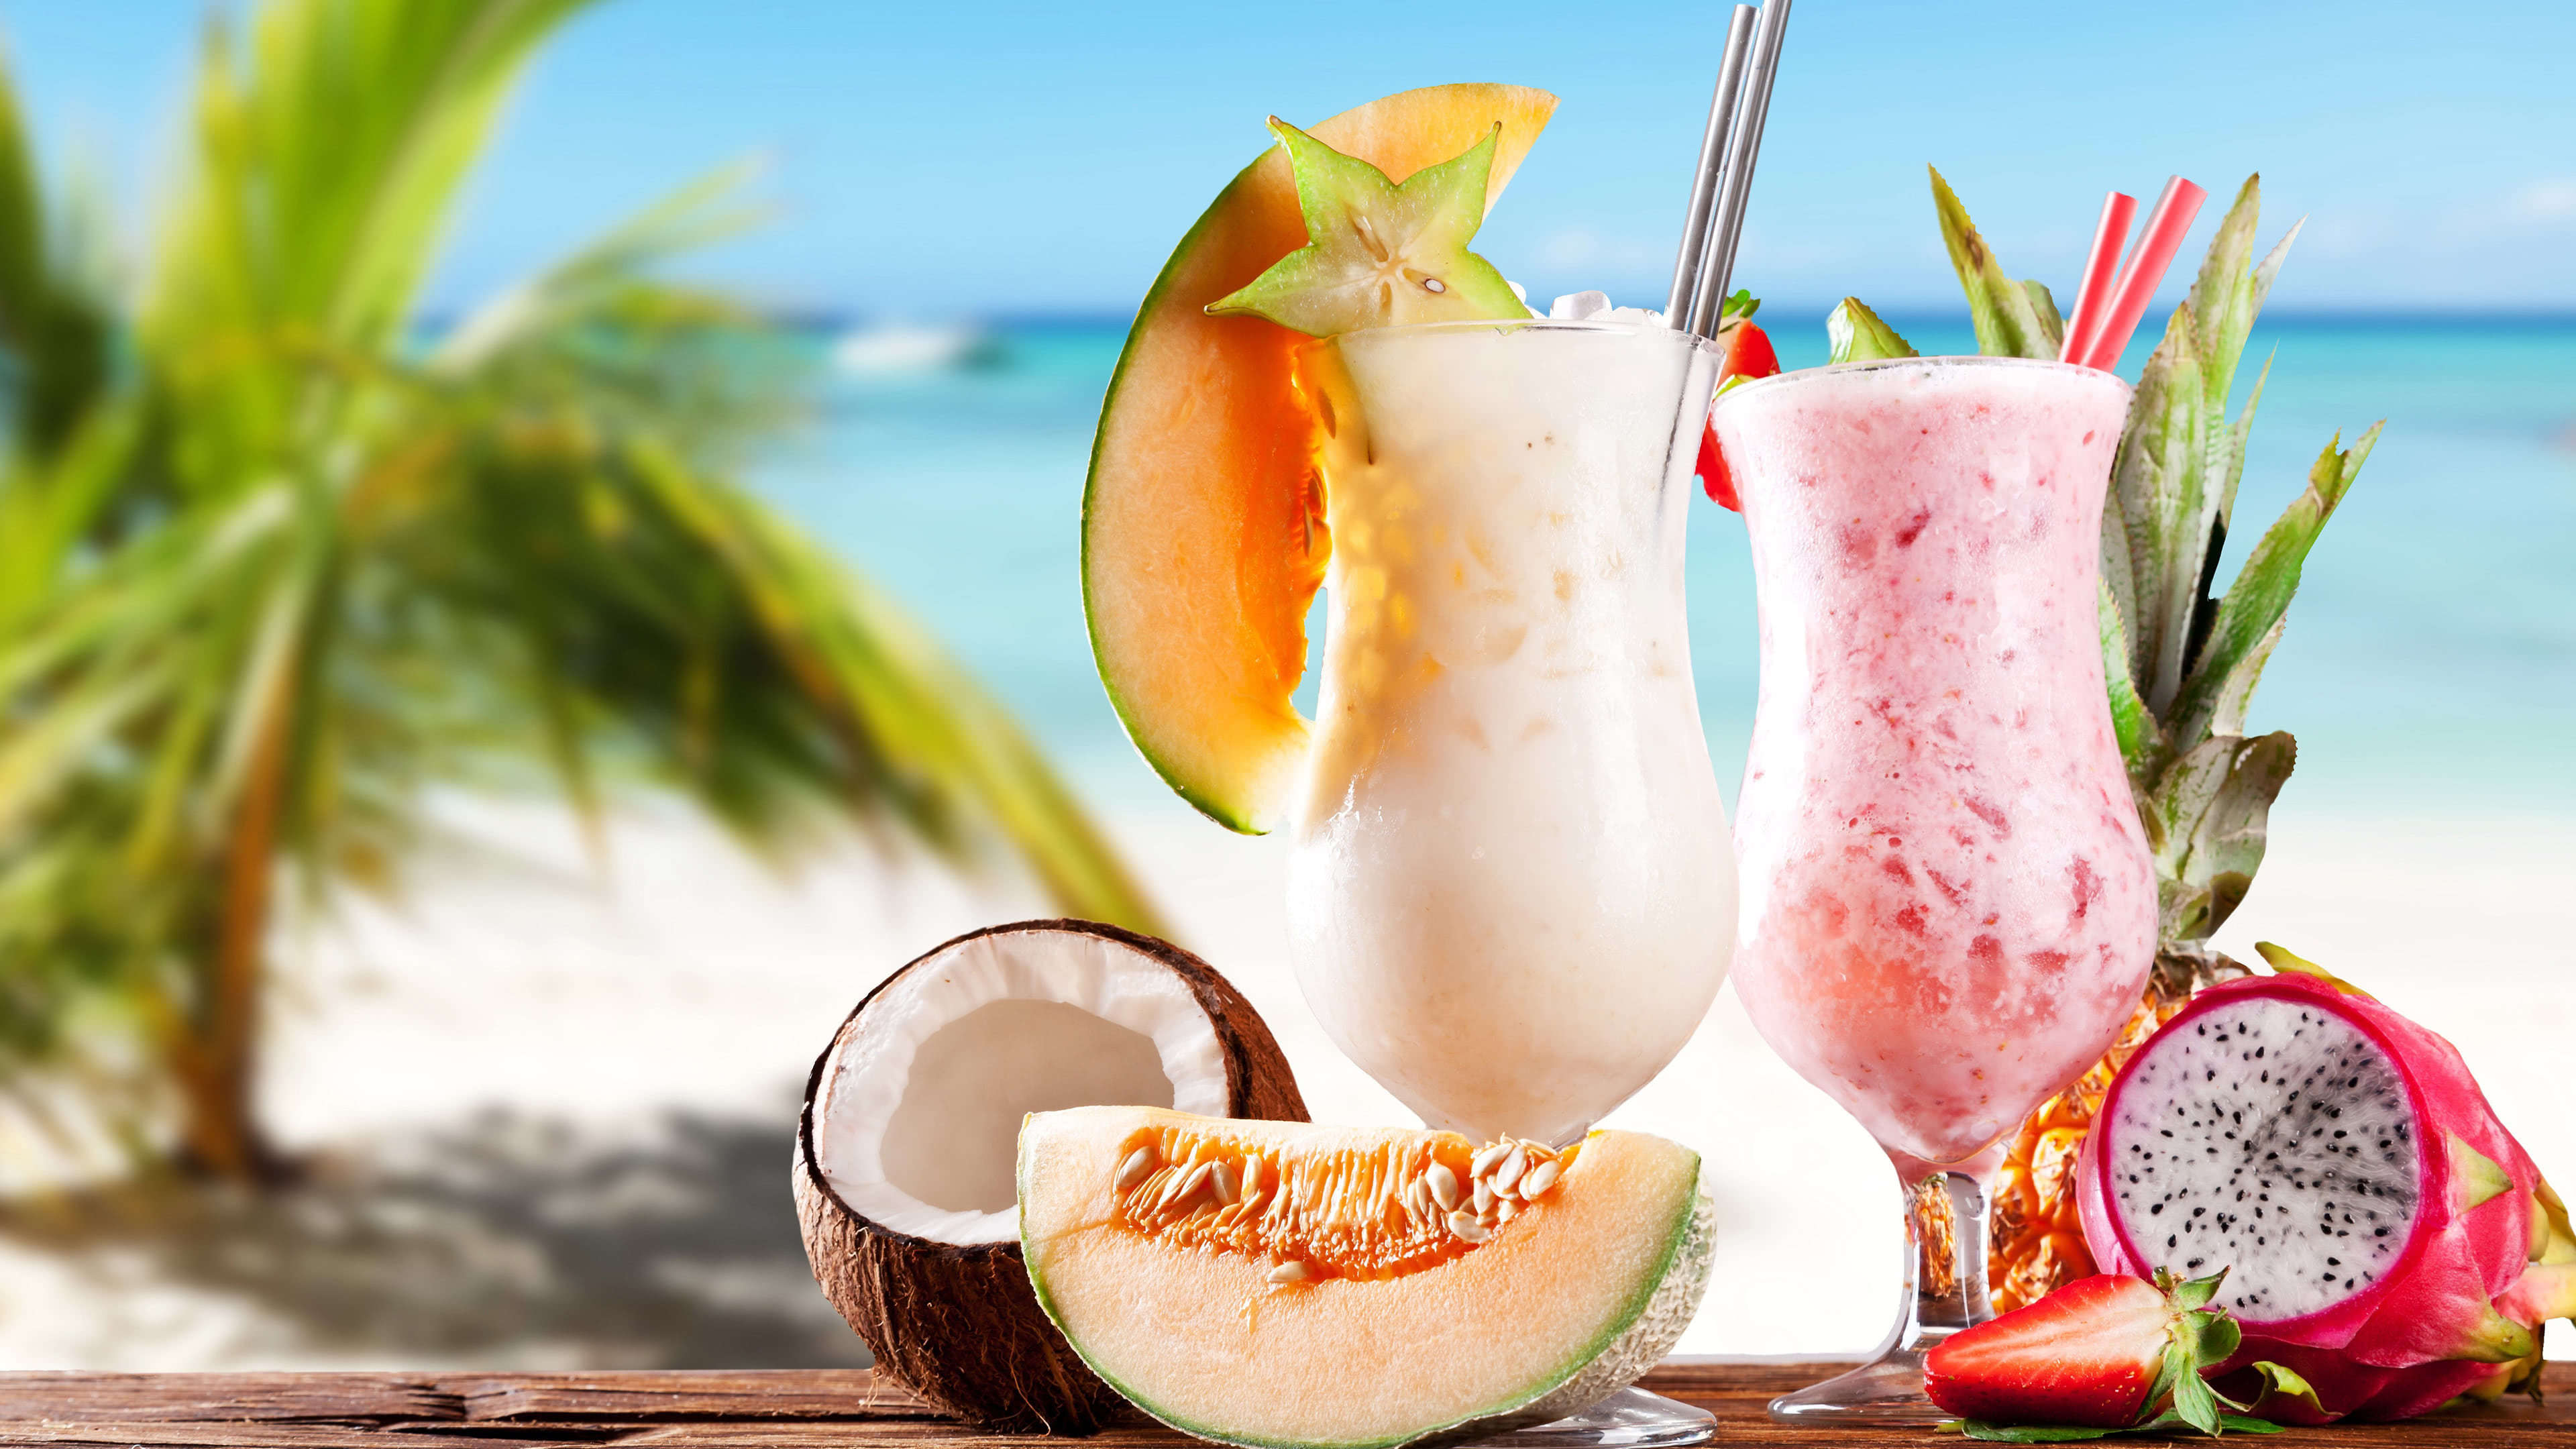 Beach Fruit Shake Cocktails Uhd 4k Wallpaper Pixelz